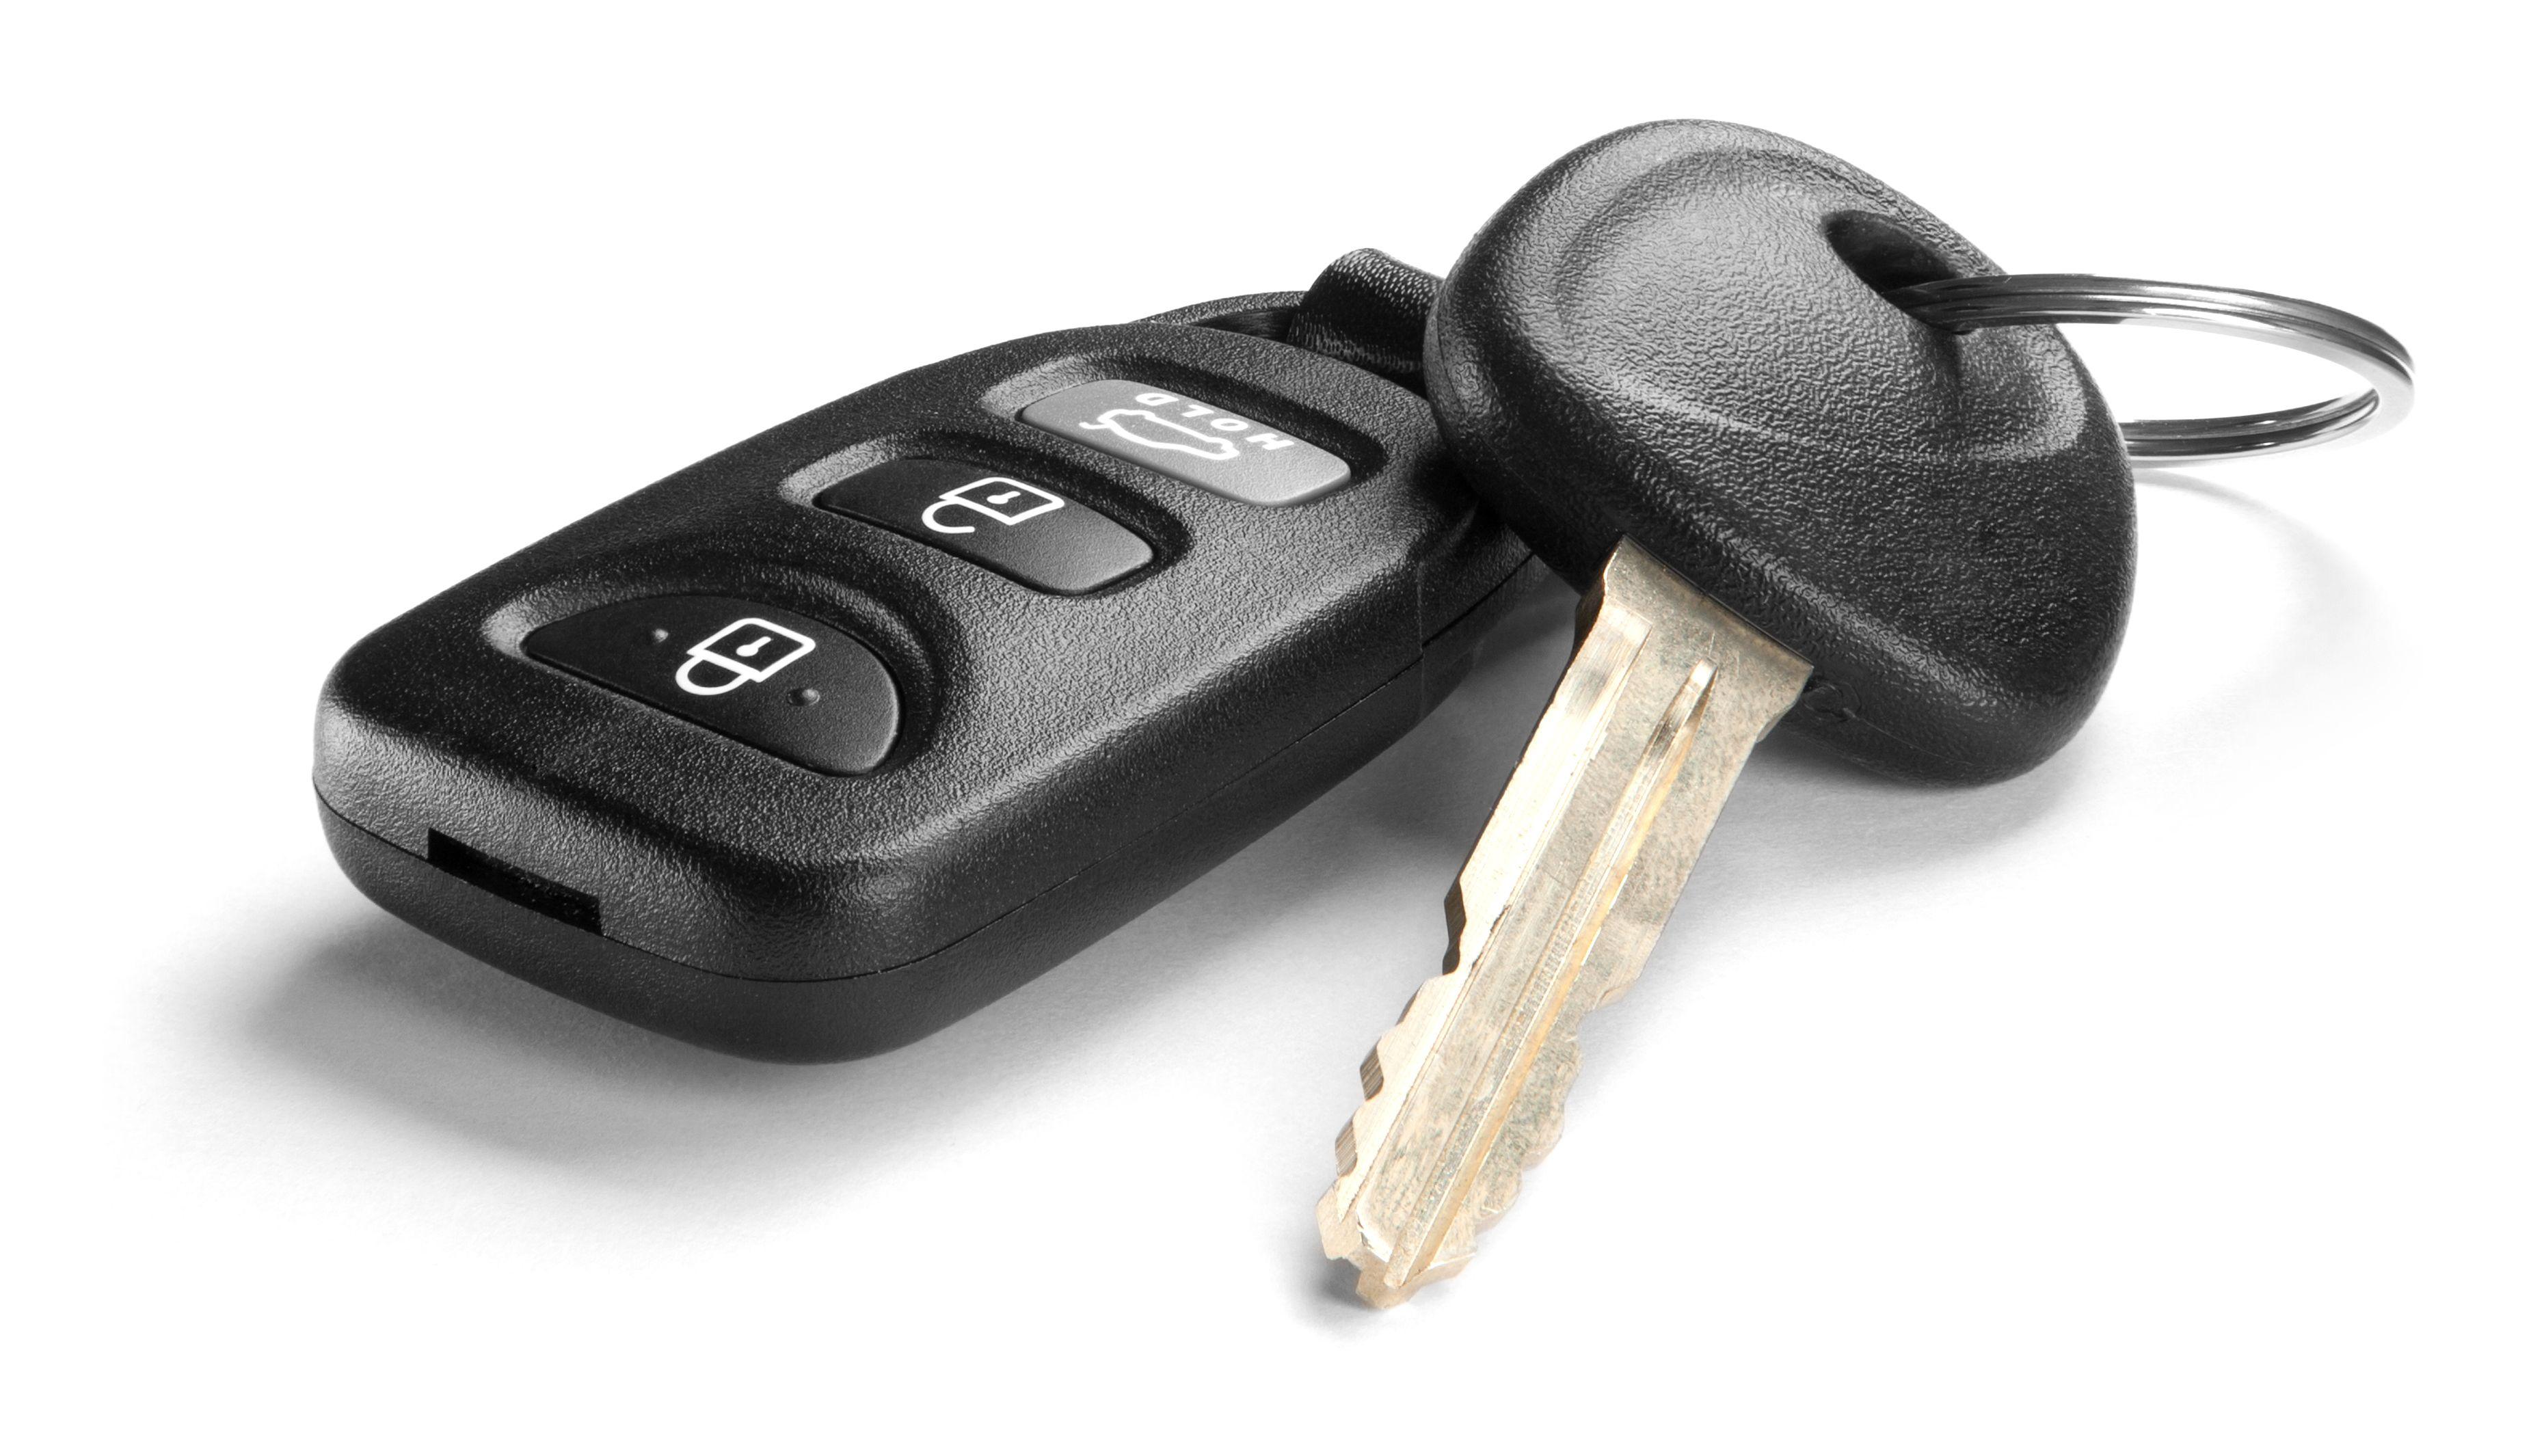 Llaves de coche codificadas en Socuéllamos